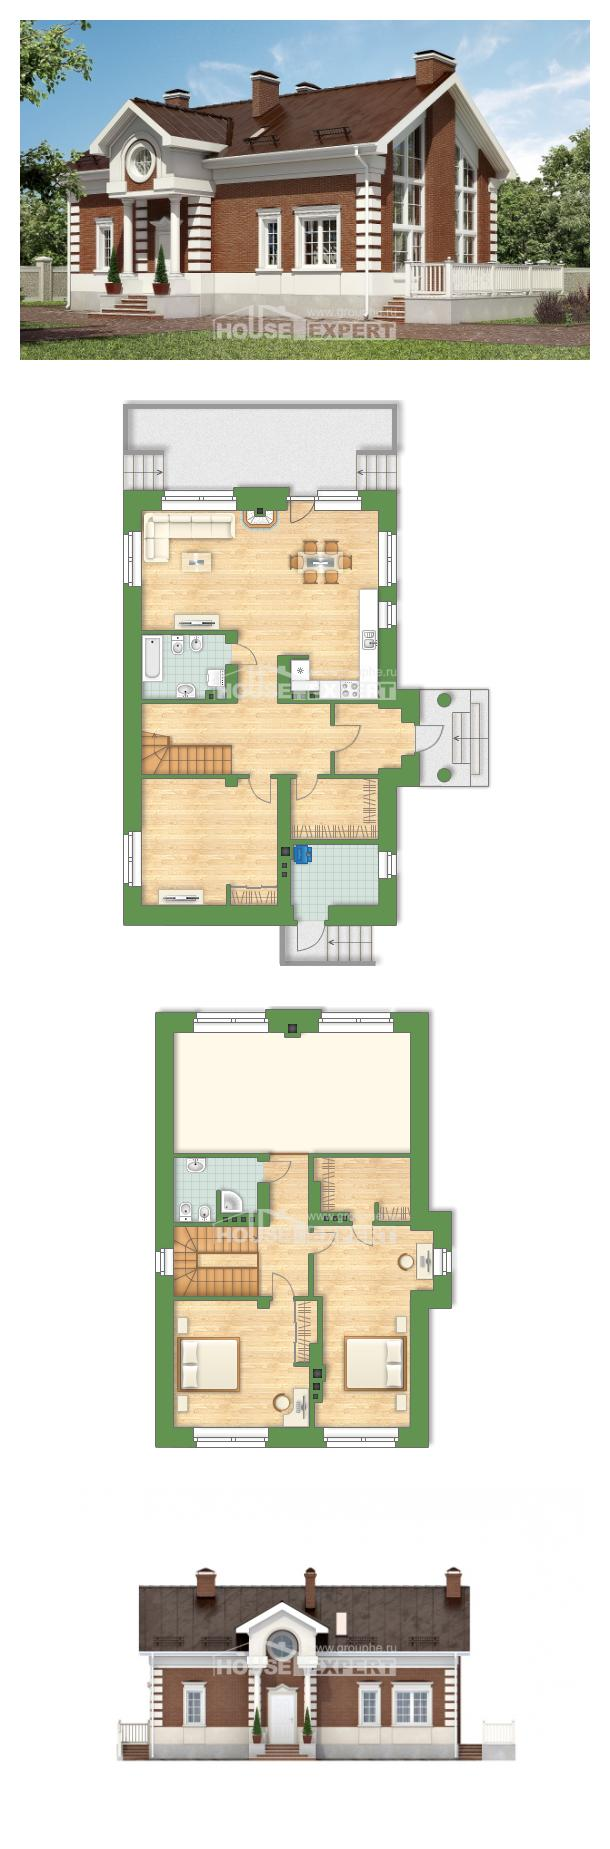 Projekt domu 160-009-R | House Expert